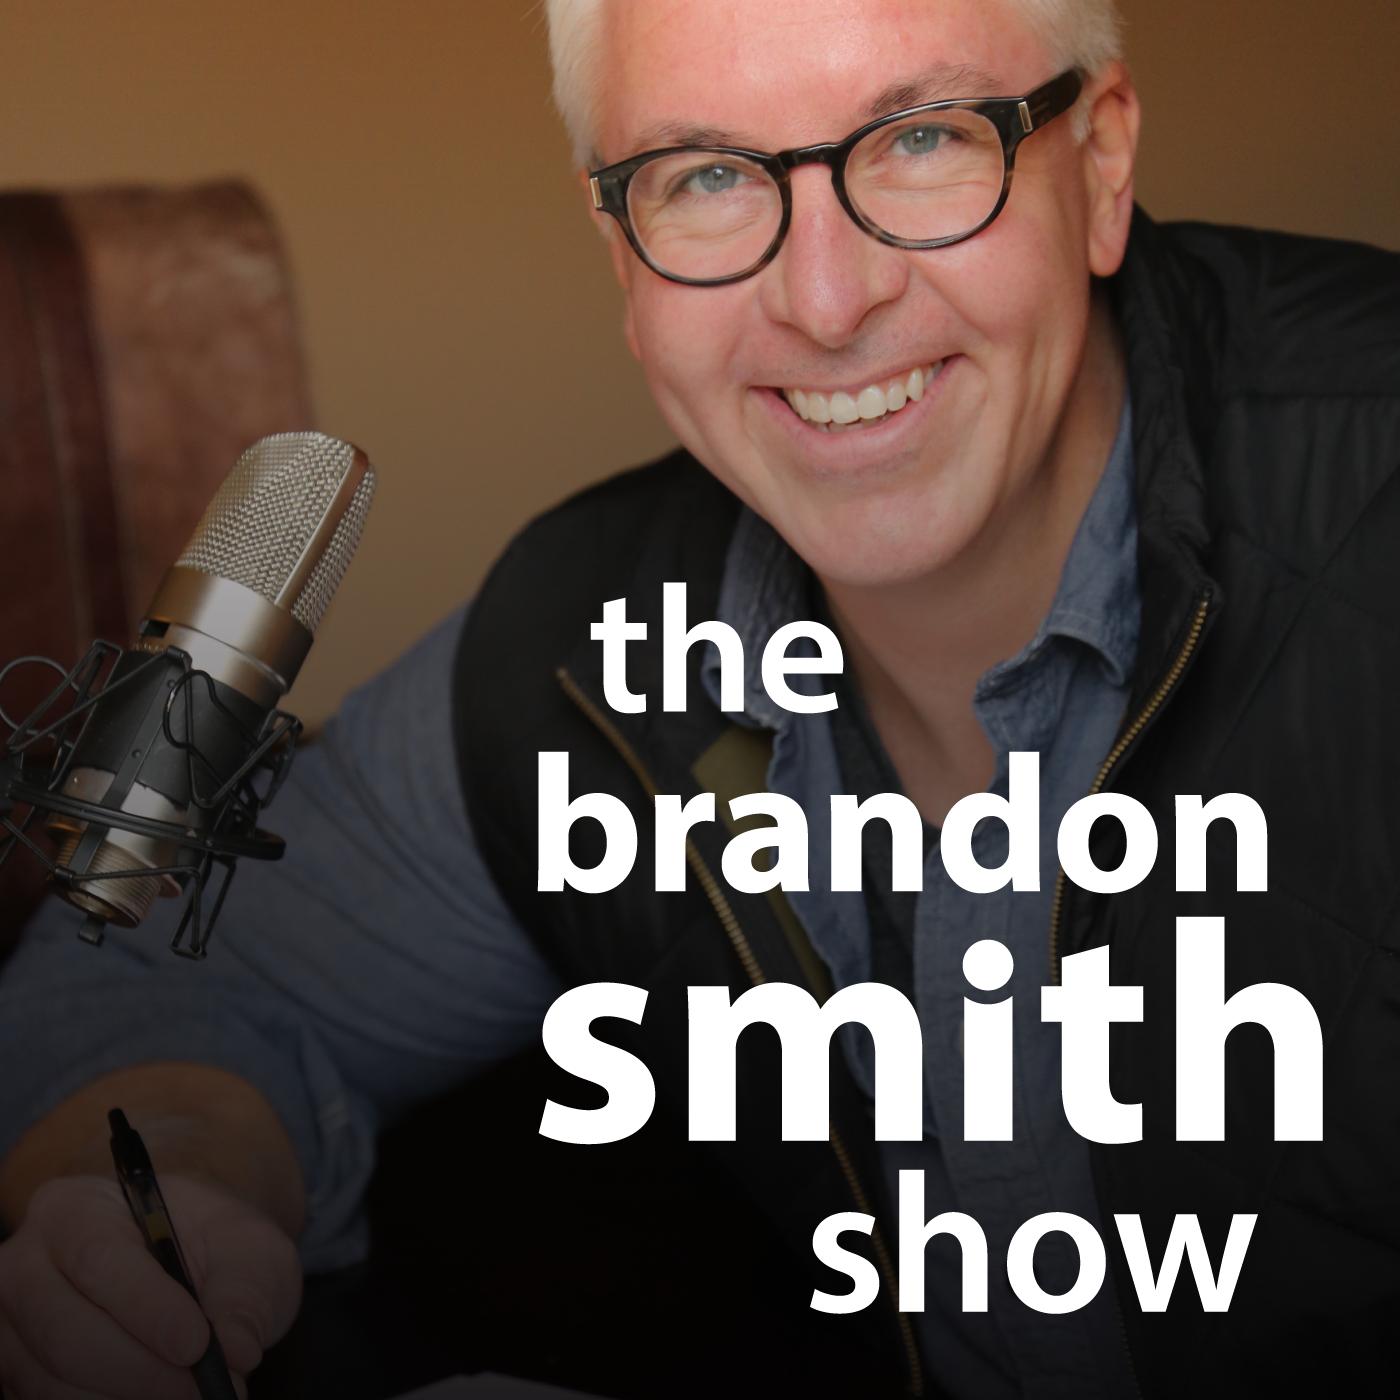 The Brandon Smith Show show art